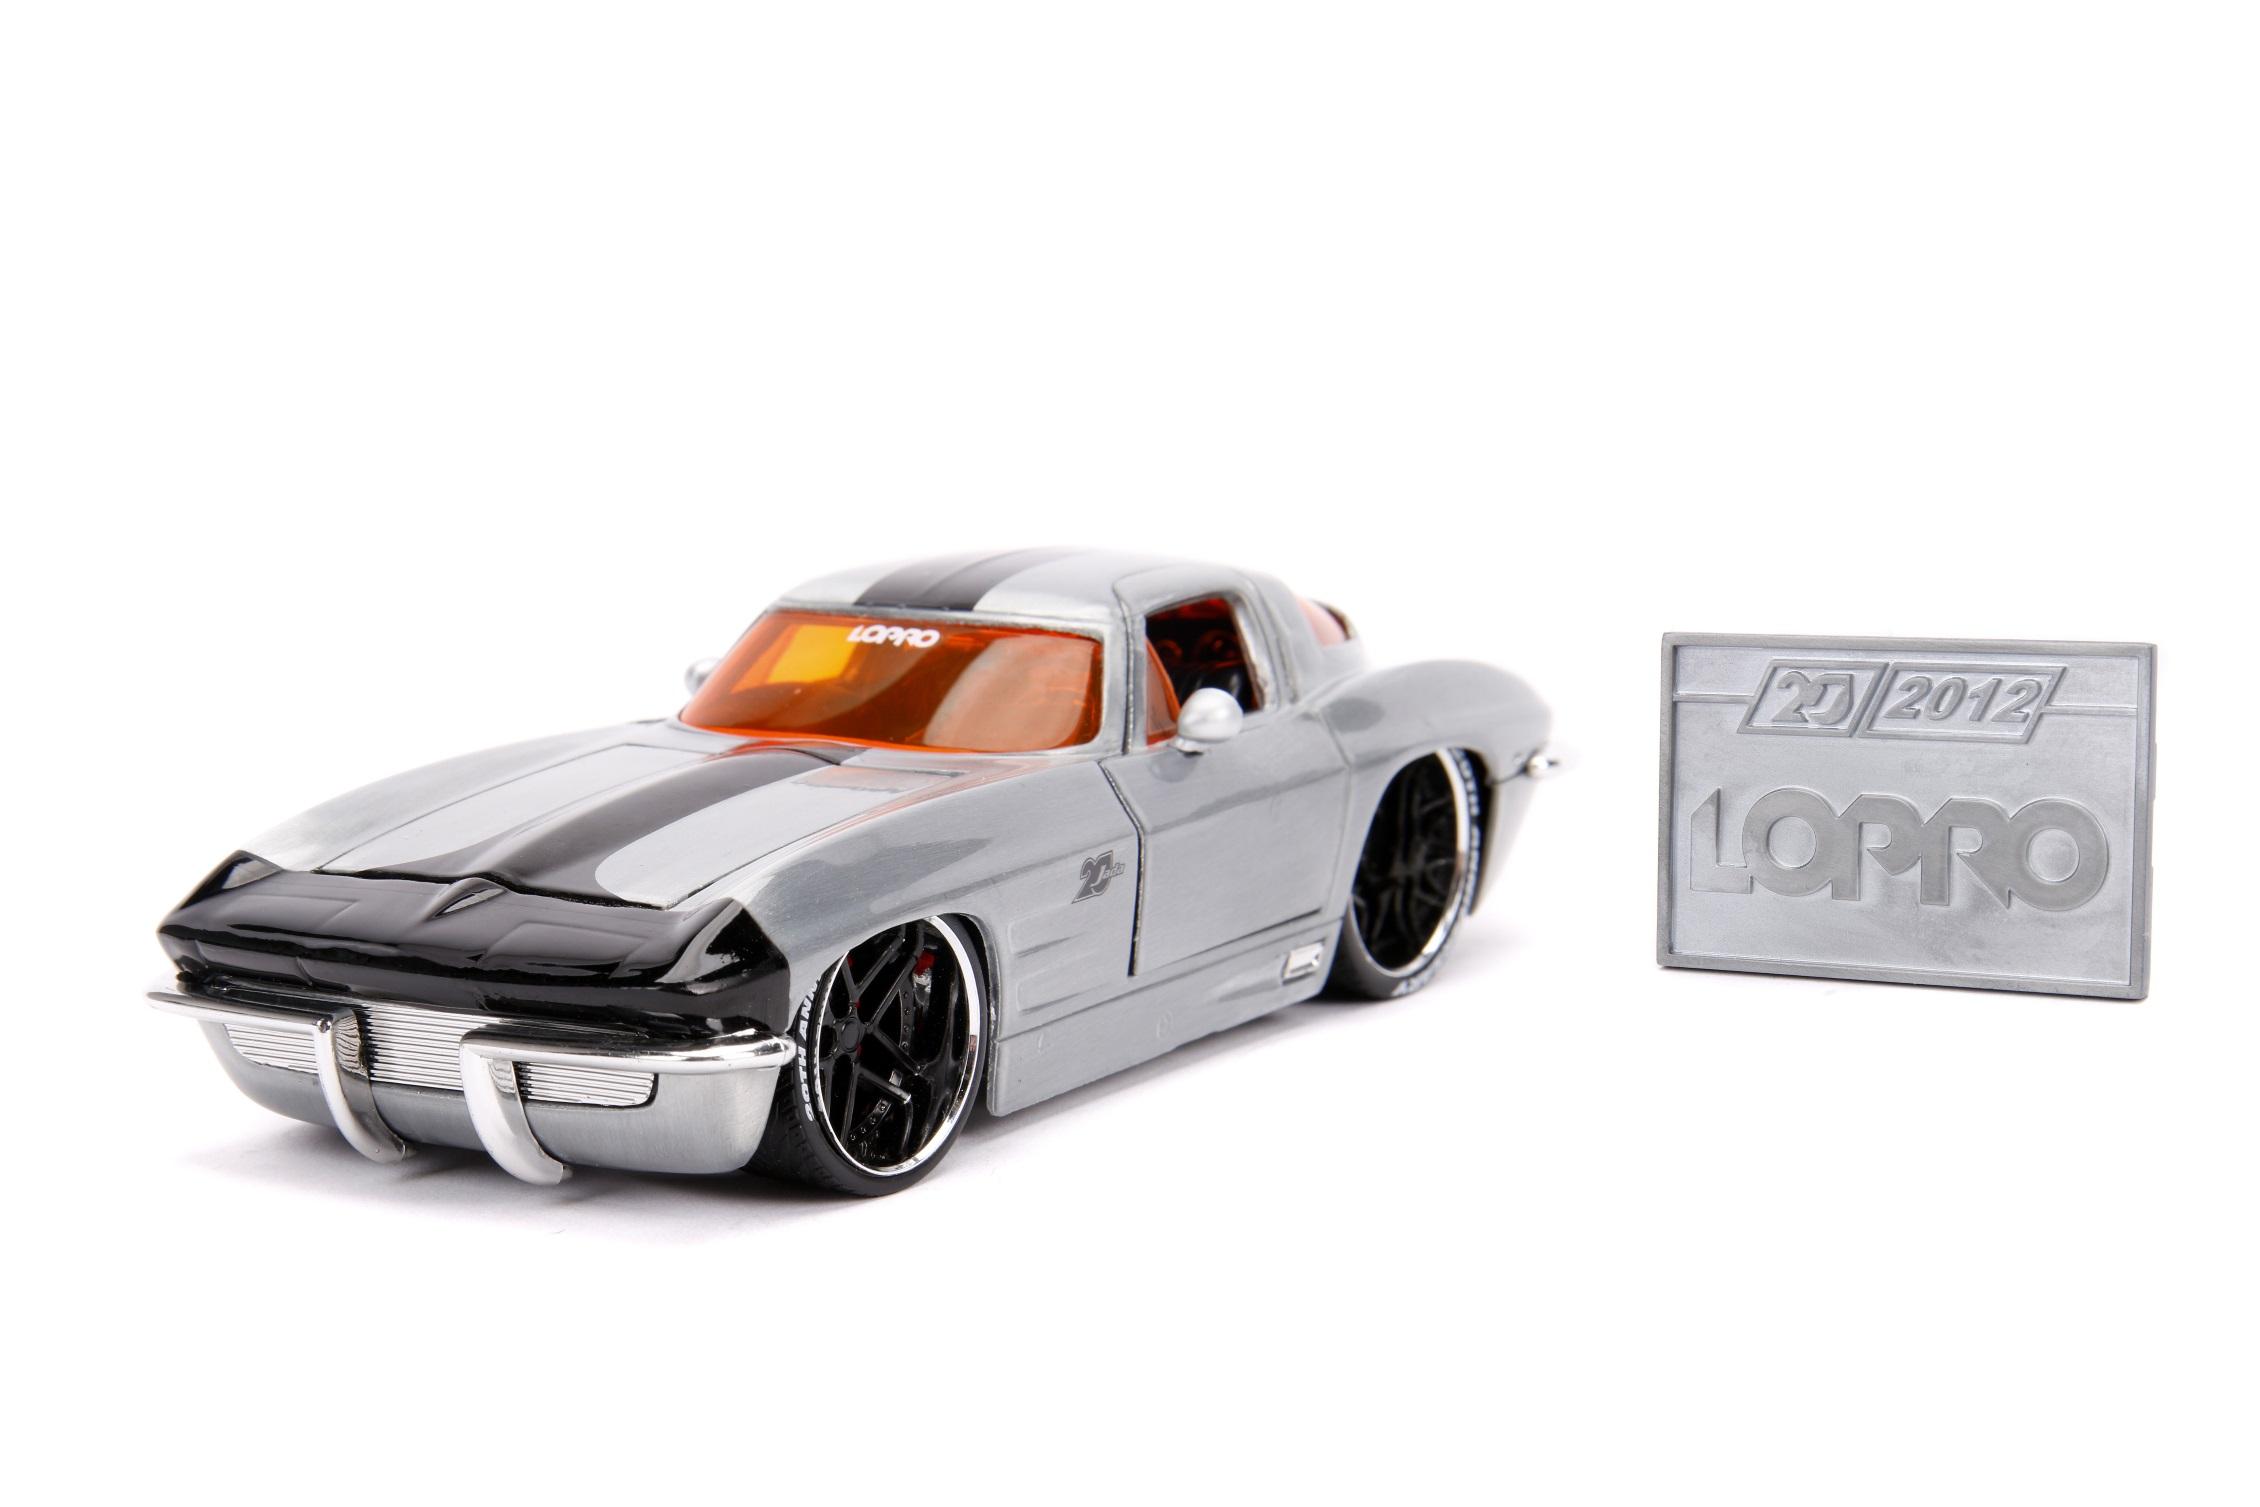 1963 Chevy Corvette - Wave 2